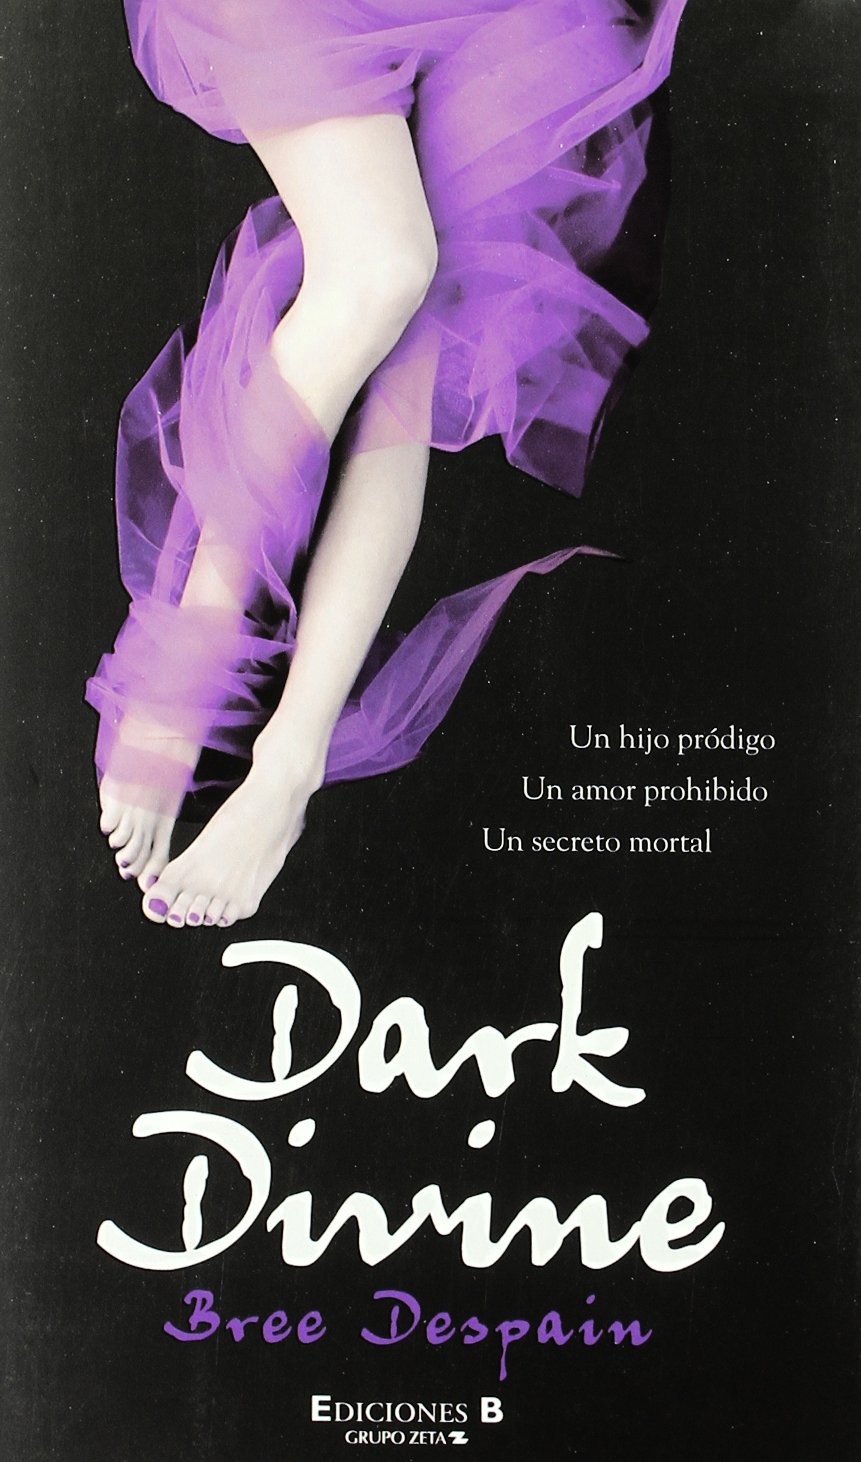 Amazon.com: Dark Divine (Spanish Edition) (9788466645416): Bree Despain: Books